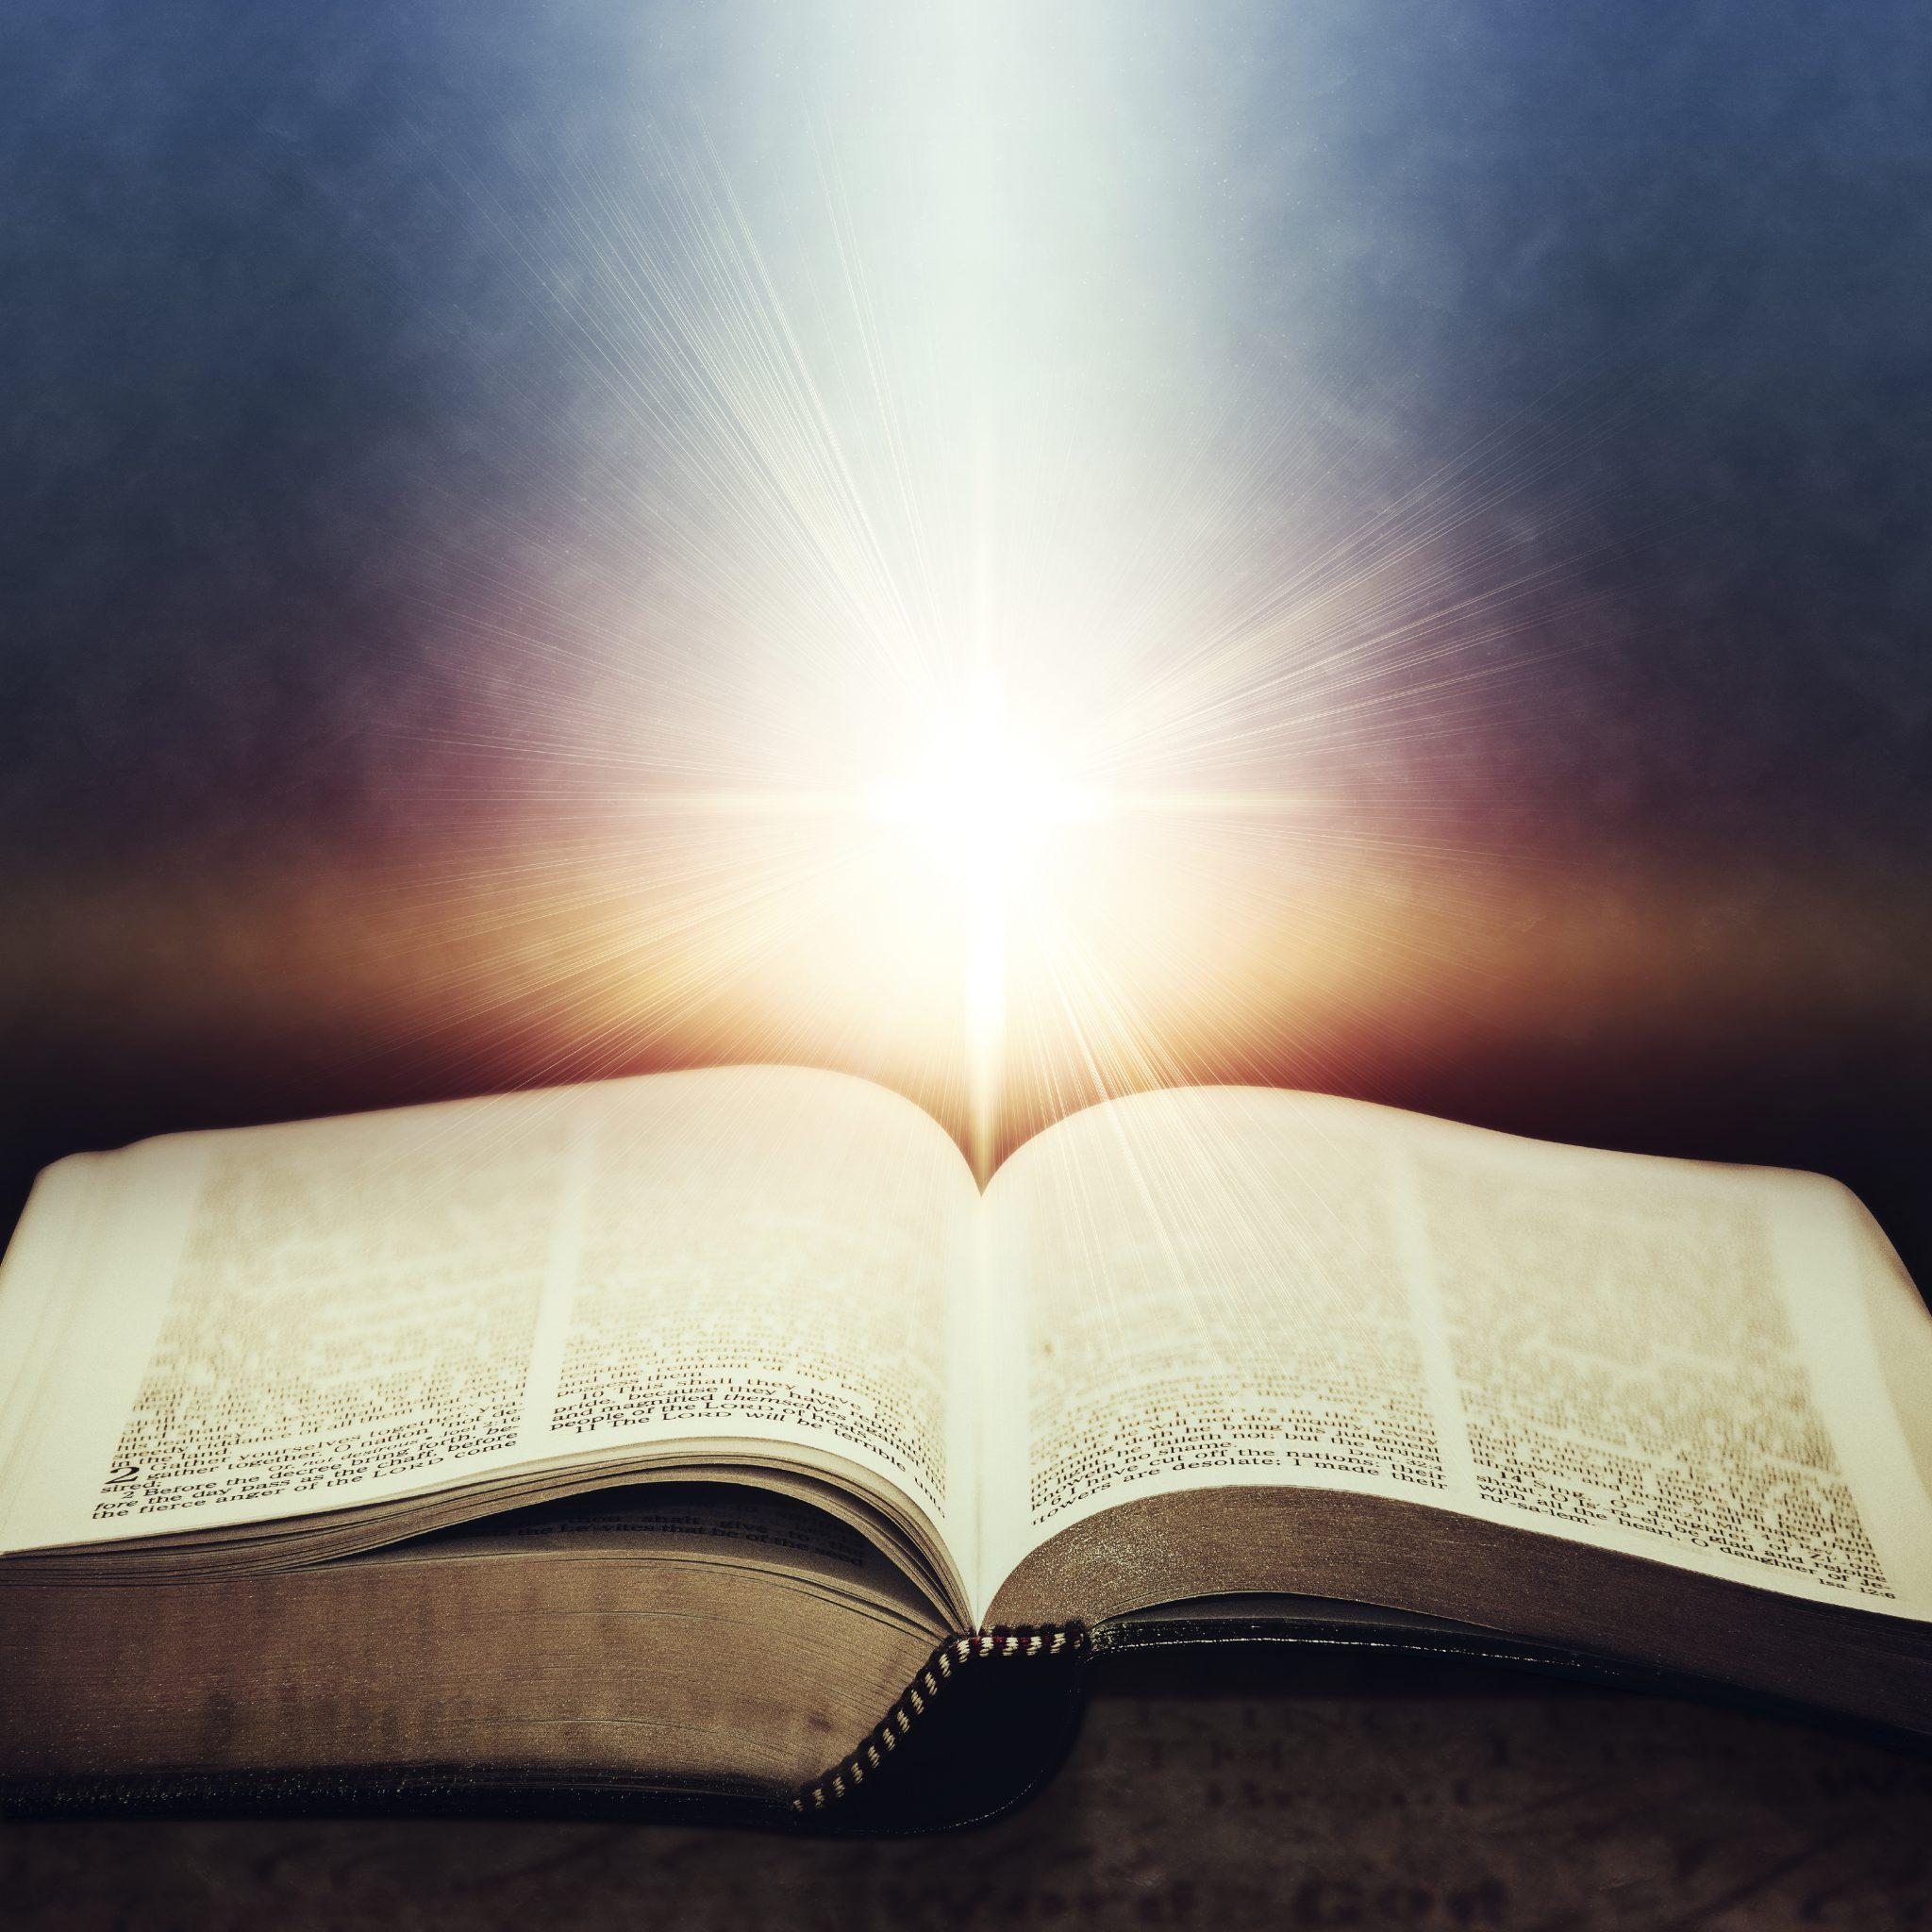 Bible Basics 101 is on the Horizon